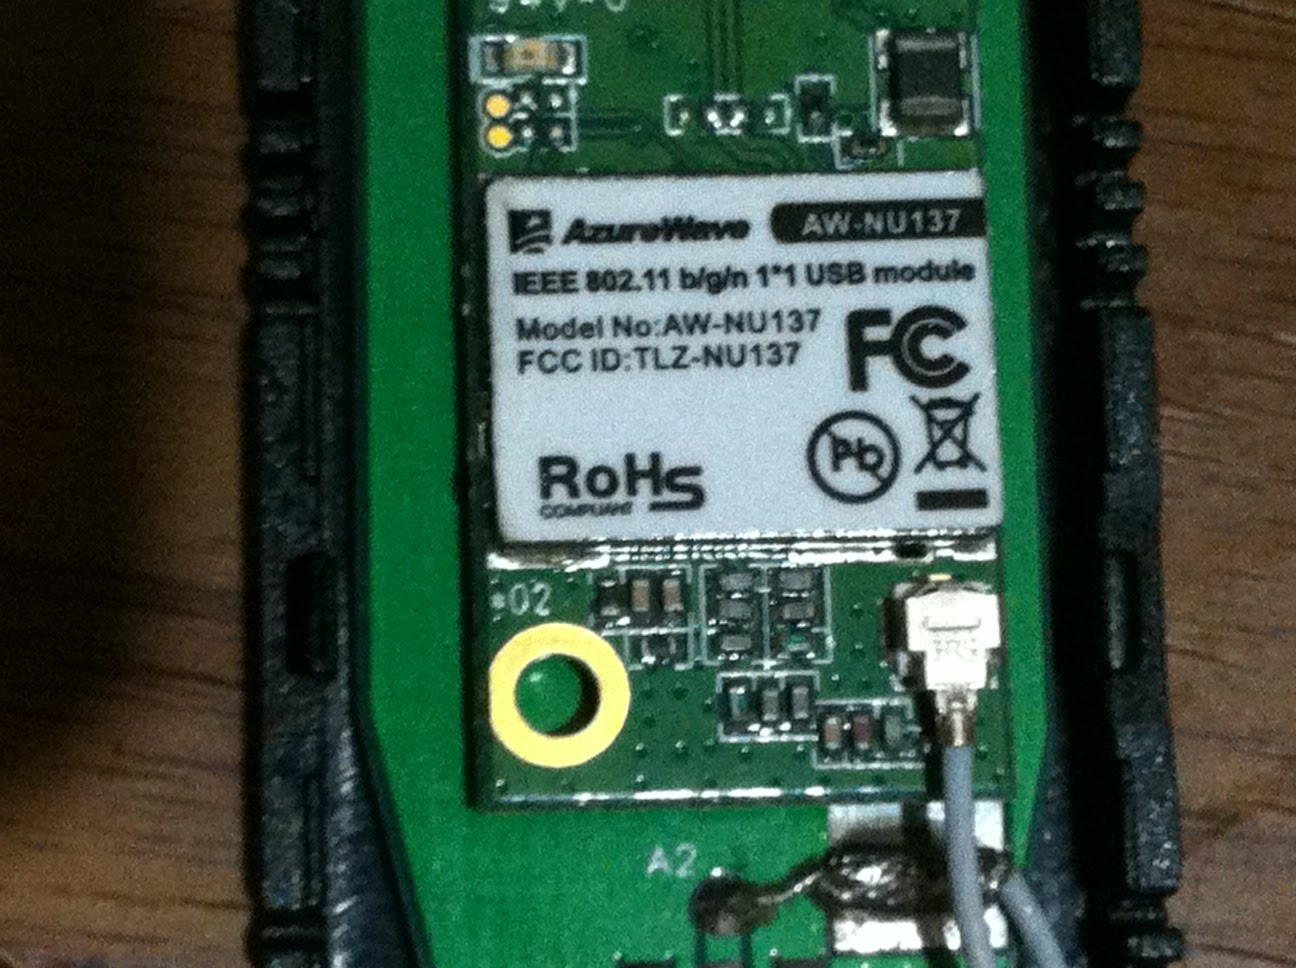 Before it gets forgotten: Modify Atheros AR9271 USB WiFi